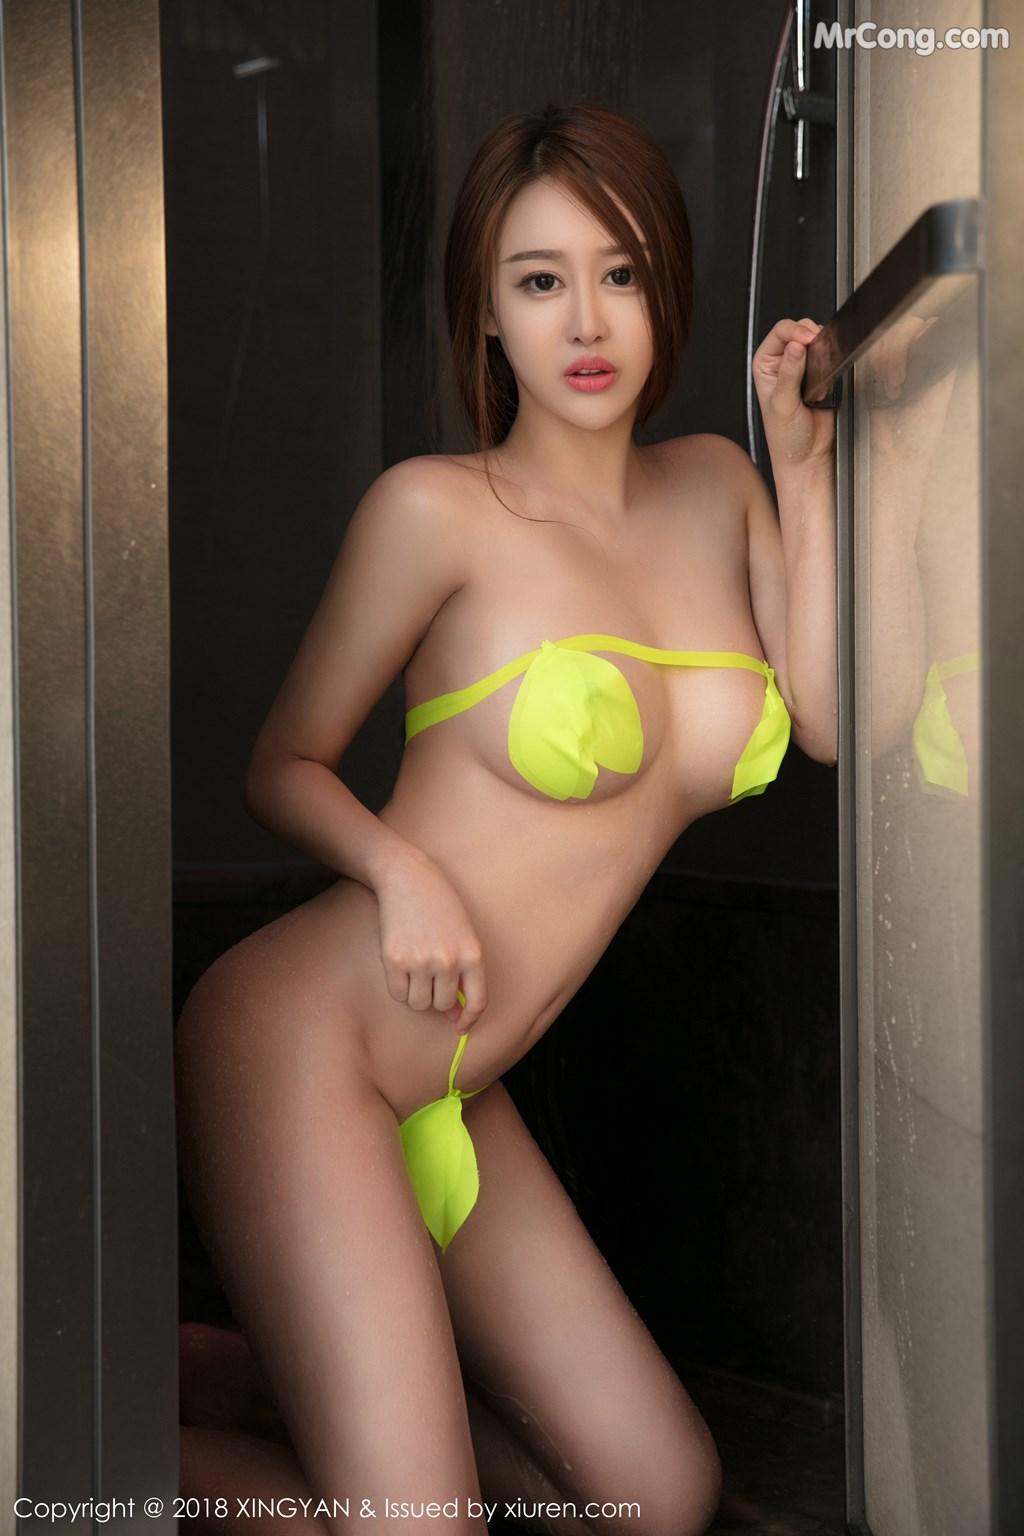 xxx nude girls: Ryu Ji Hye - Strapless bubble Mini Dress